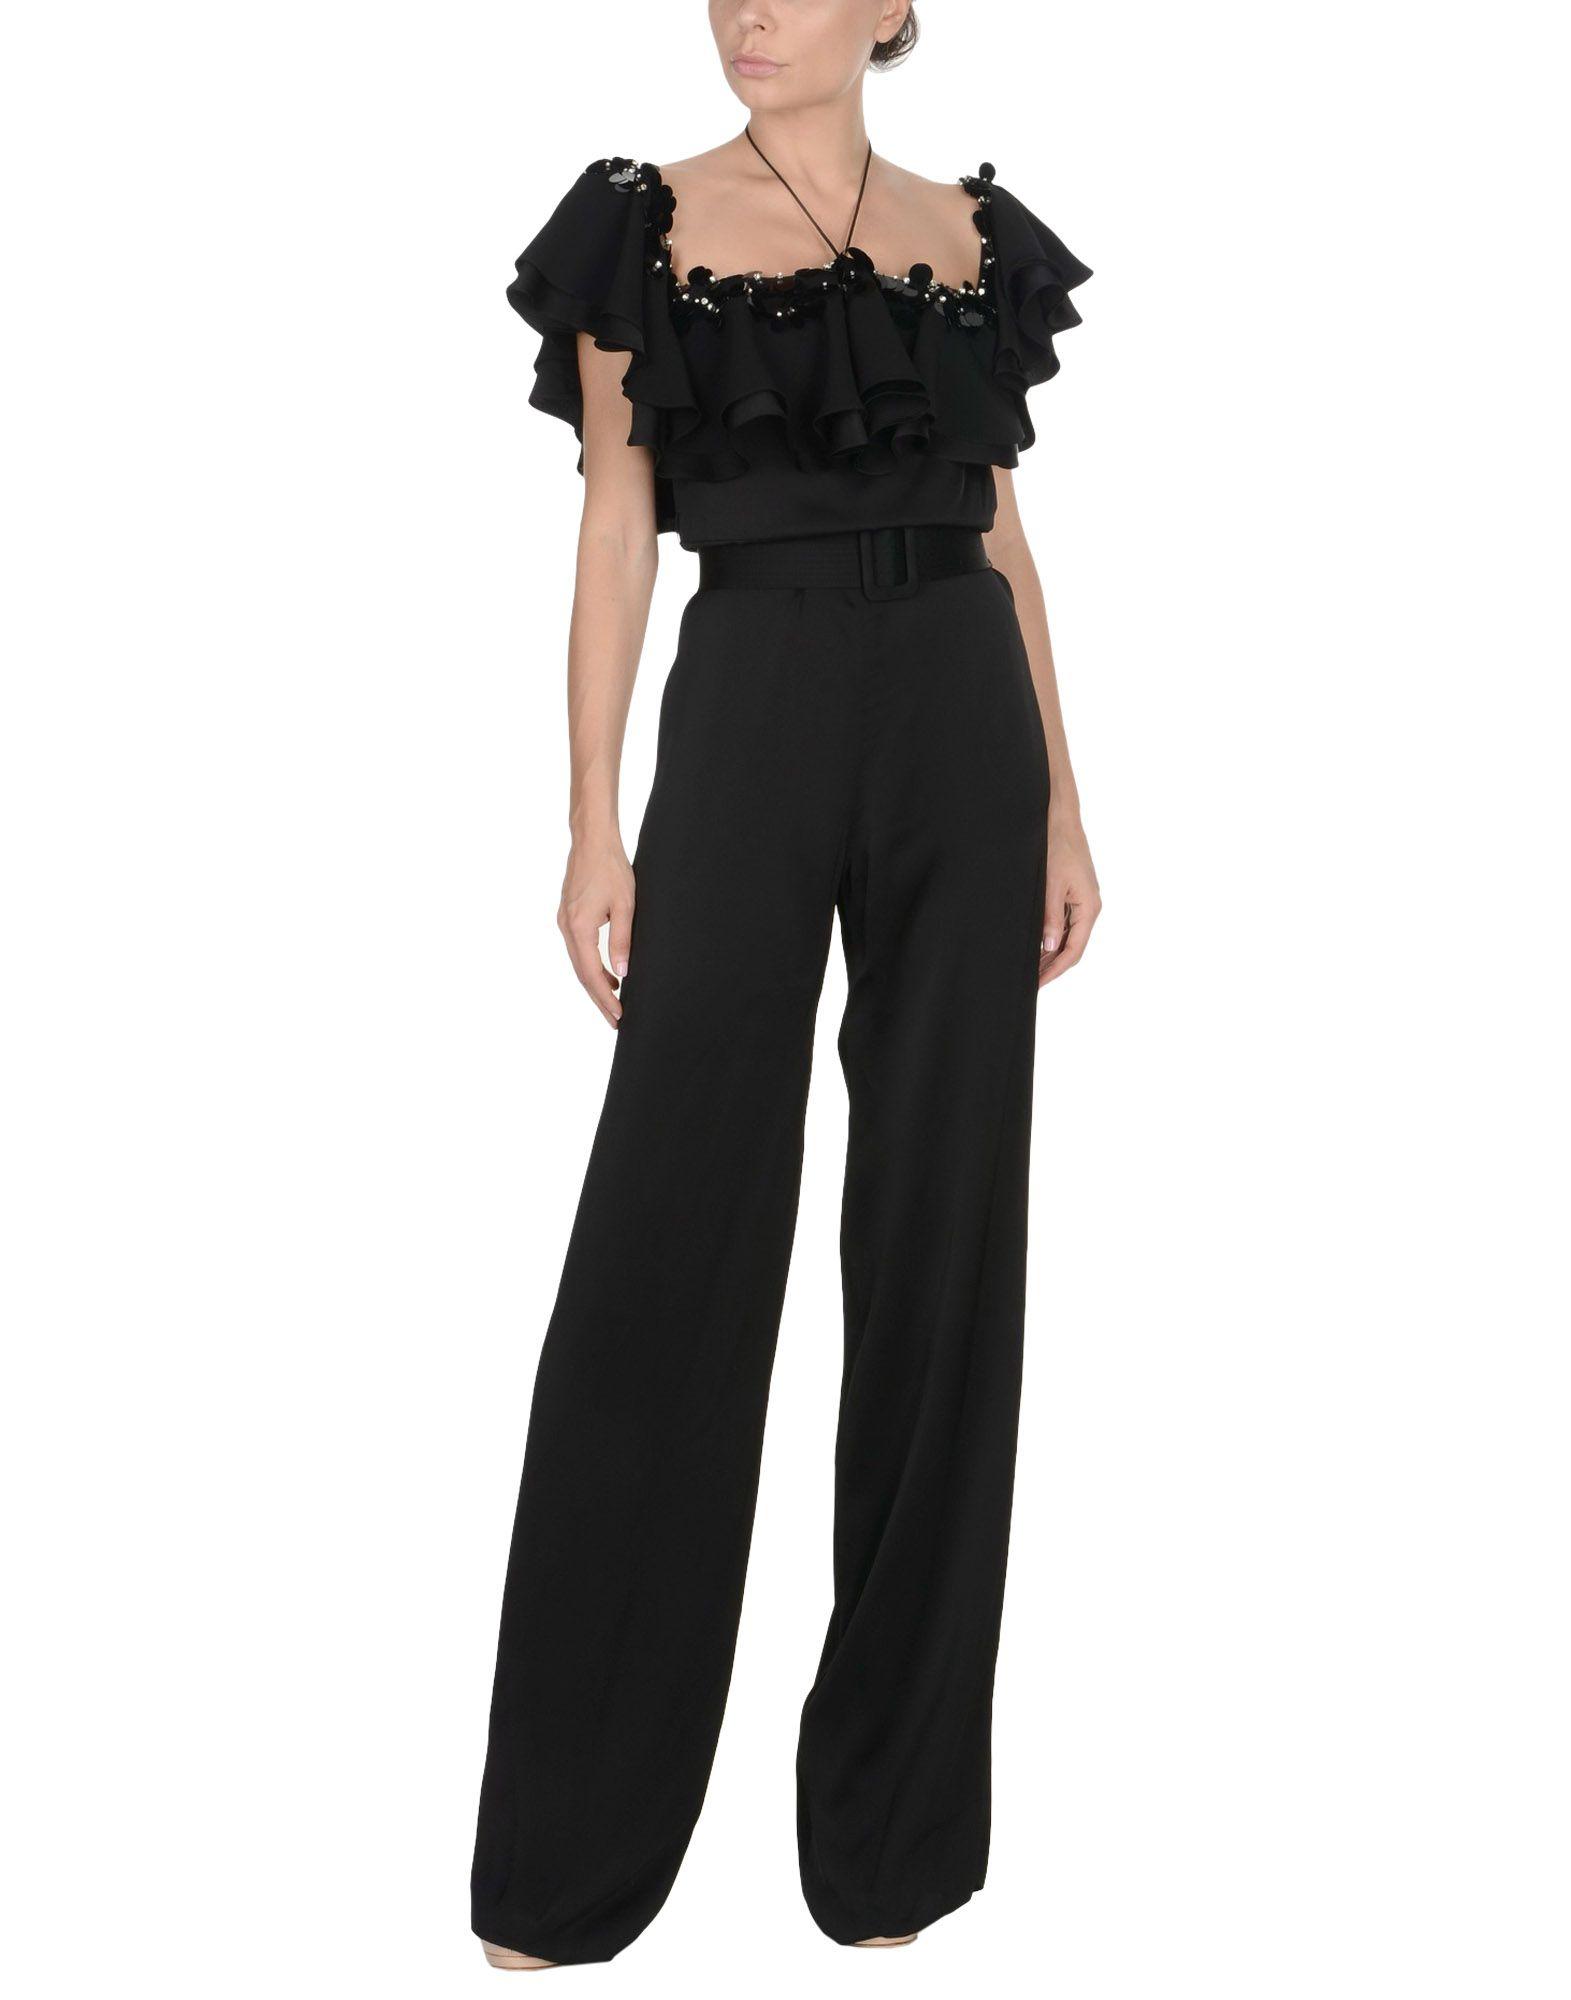 dc5c0d85358a Buy clothing for women - Best women's clothing shop - Cools.com